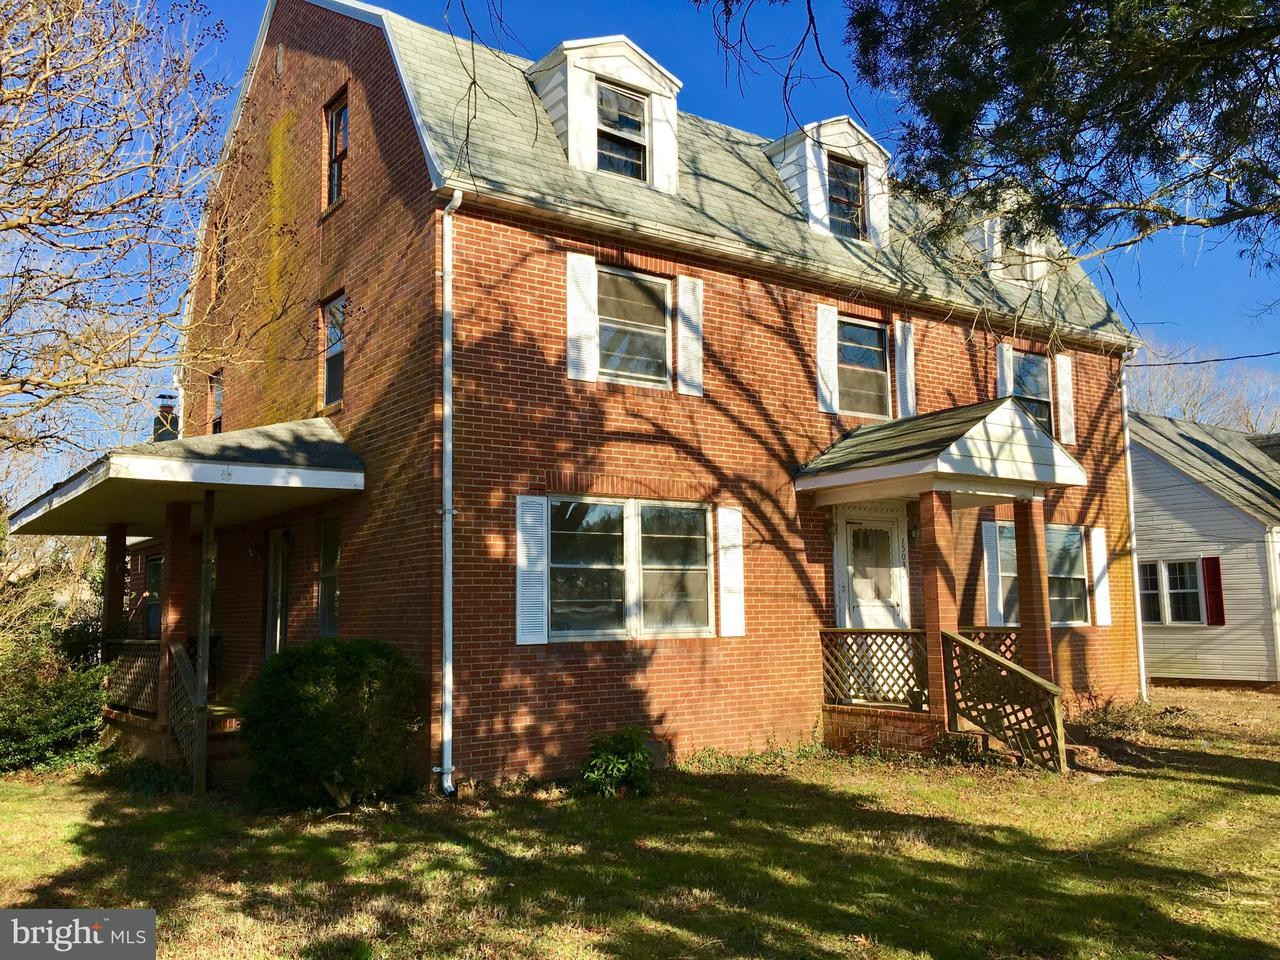 Single Family for Sale at 1503 Market St Pocomoke City, Maryland 21851 United States